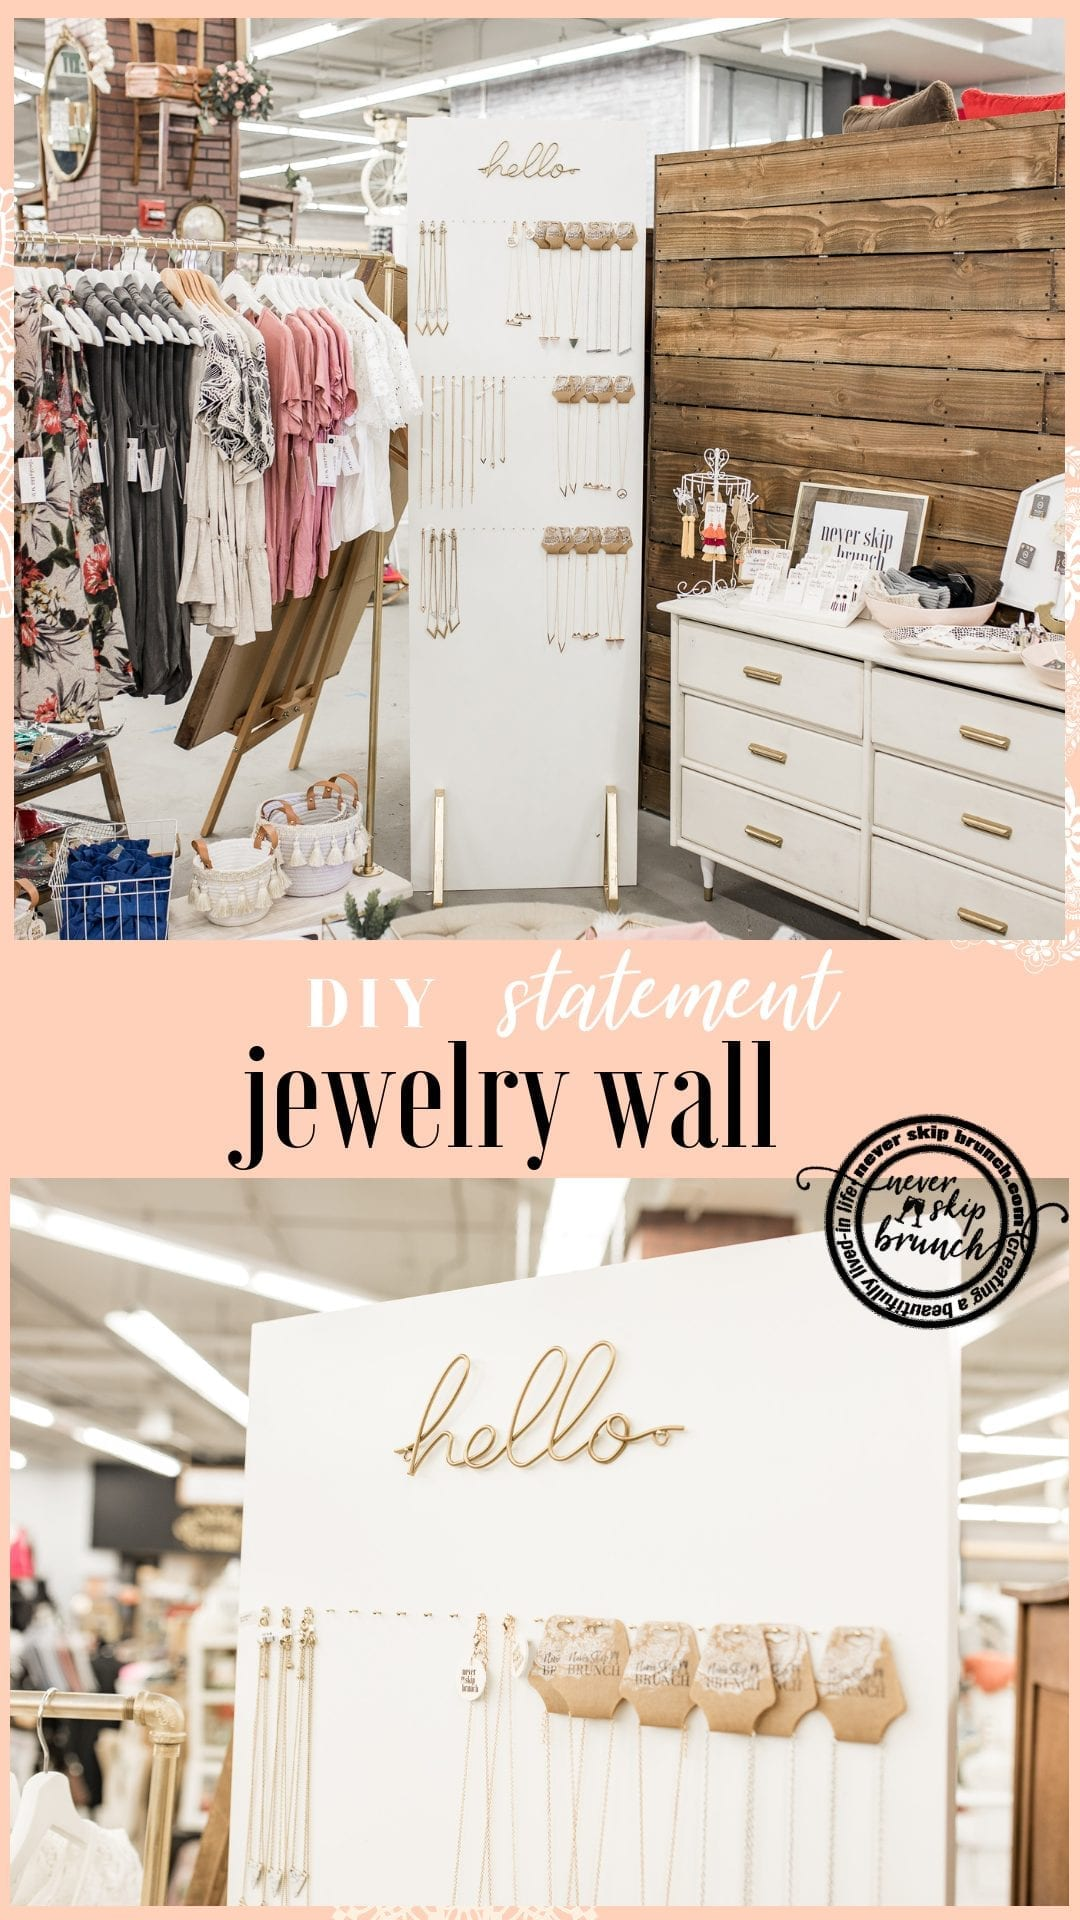 jewelry wall diy | Necklace holder | jewelry statement wall | jewelry organization diy | Never Skip Brunch by Cara Newhart | #decor #diy #jewelry #neverskipbrunch